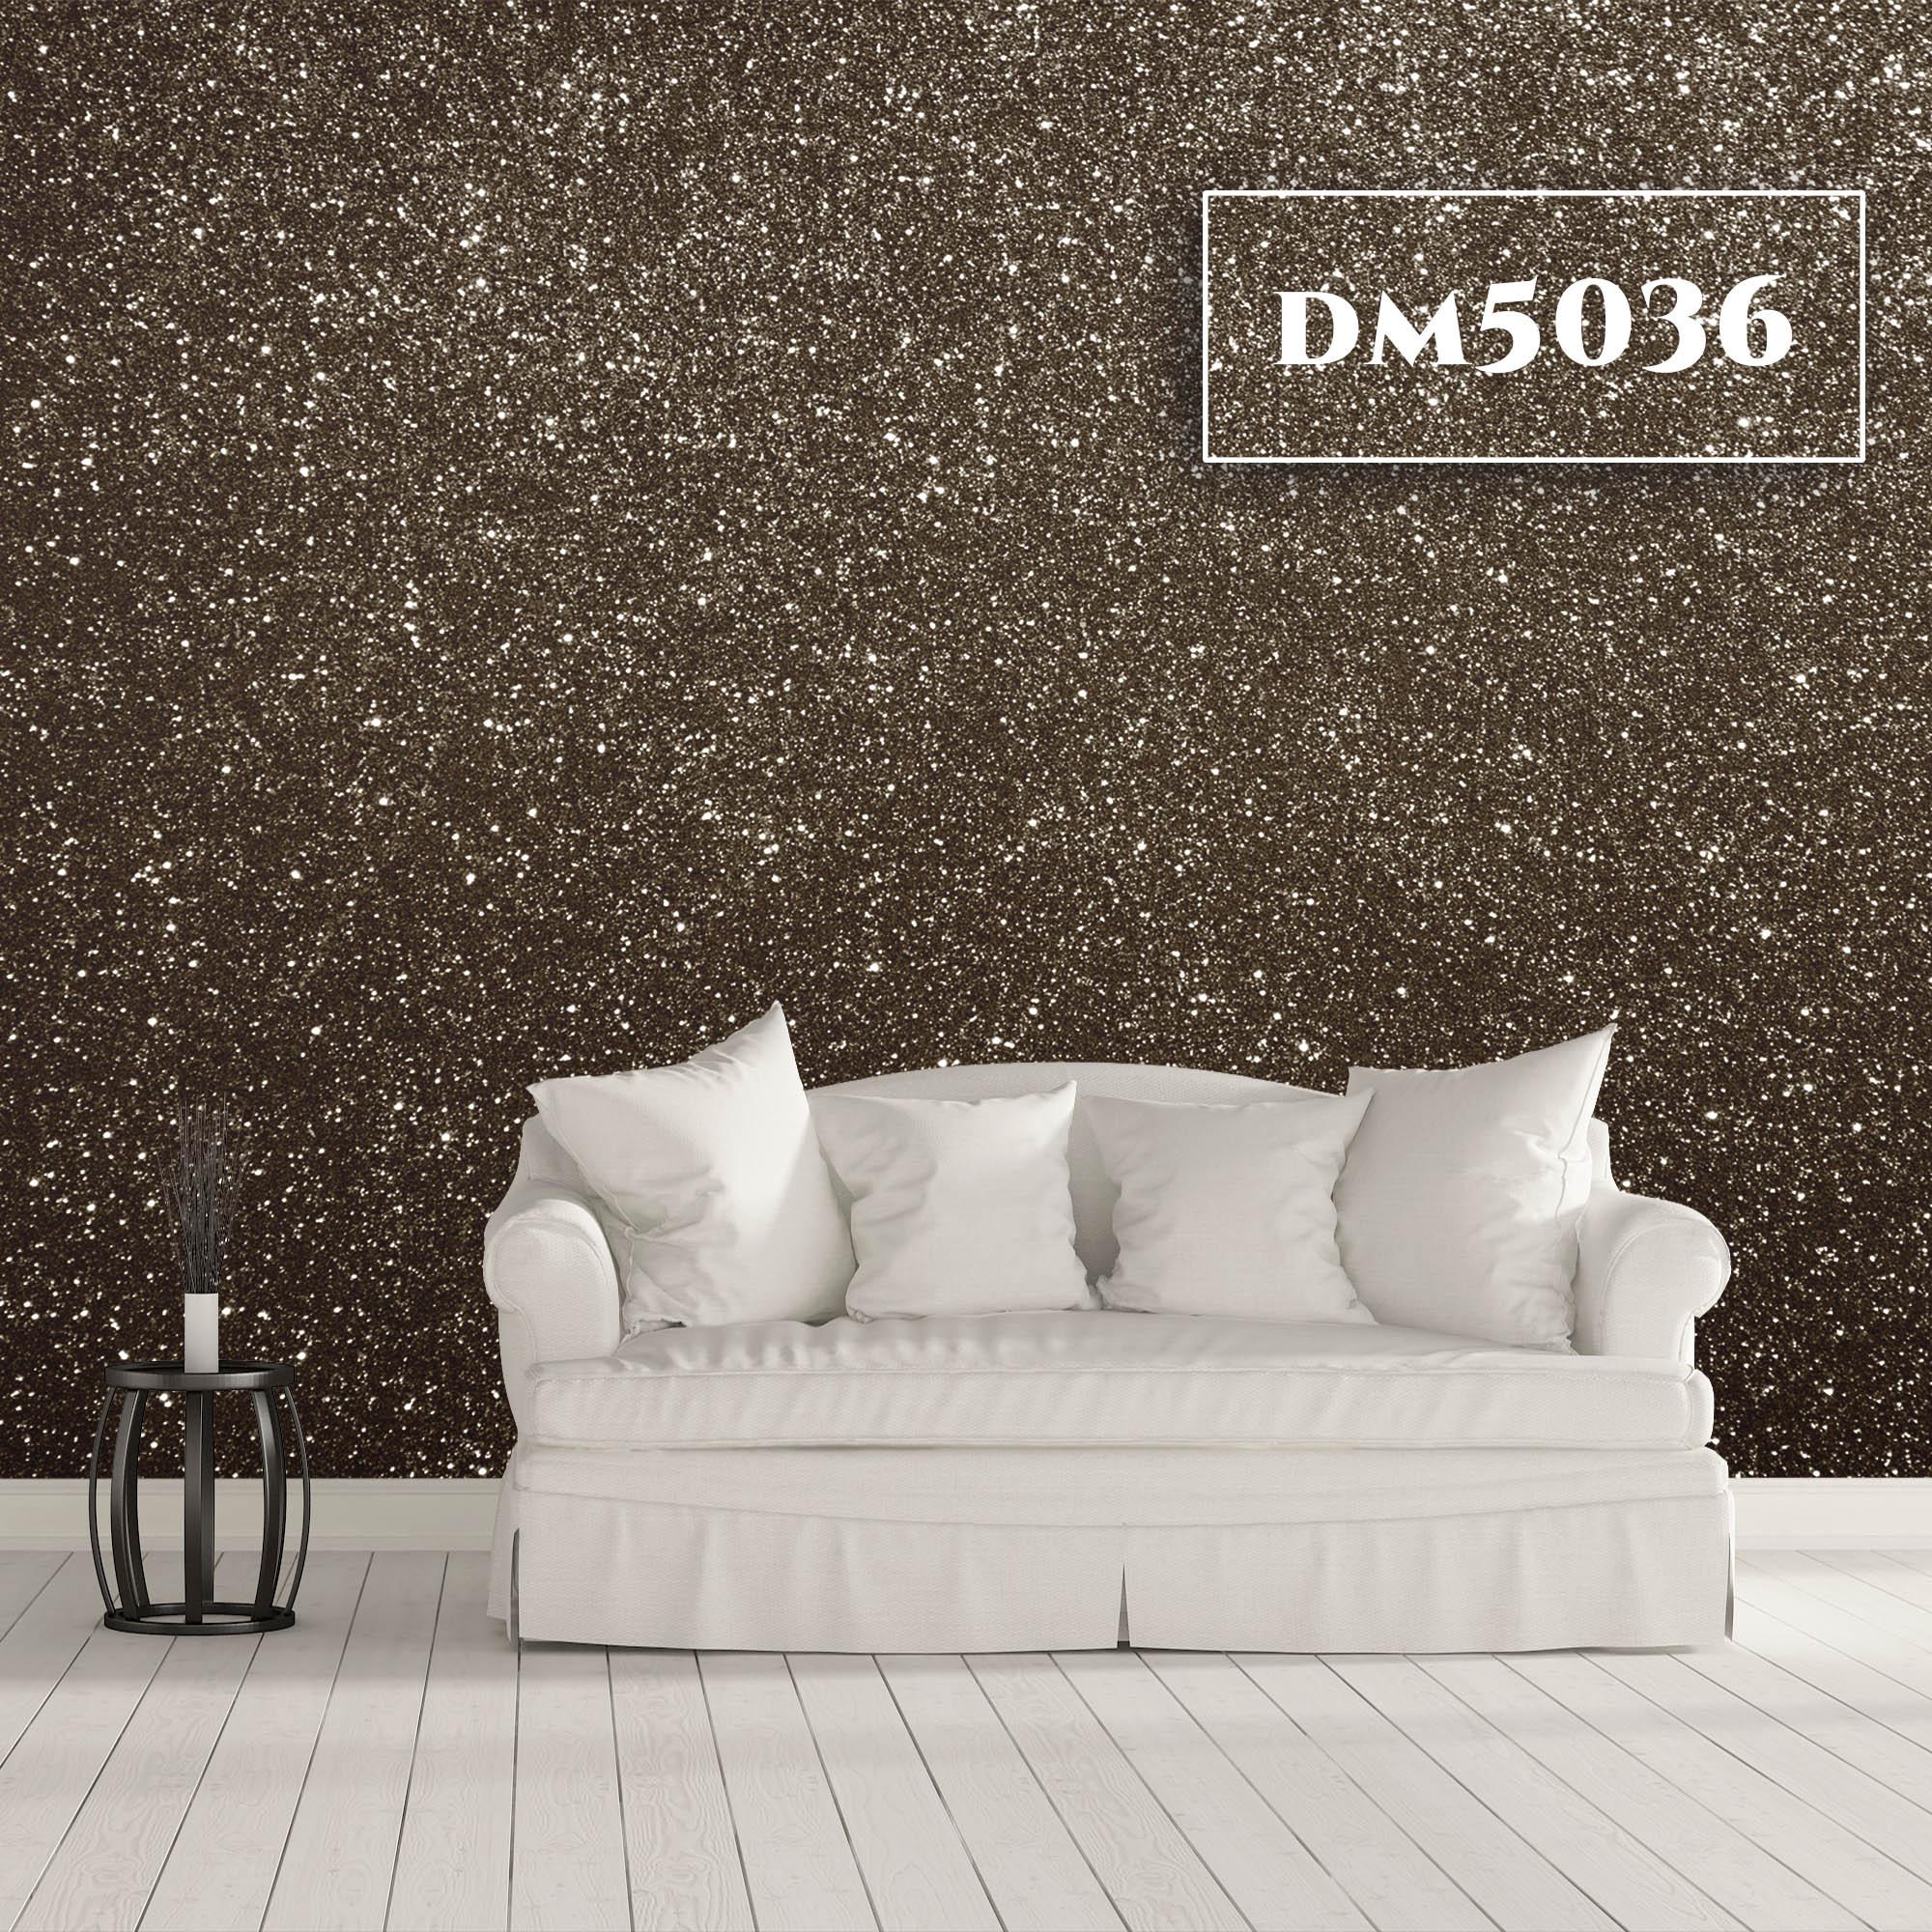 DM5036